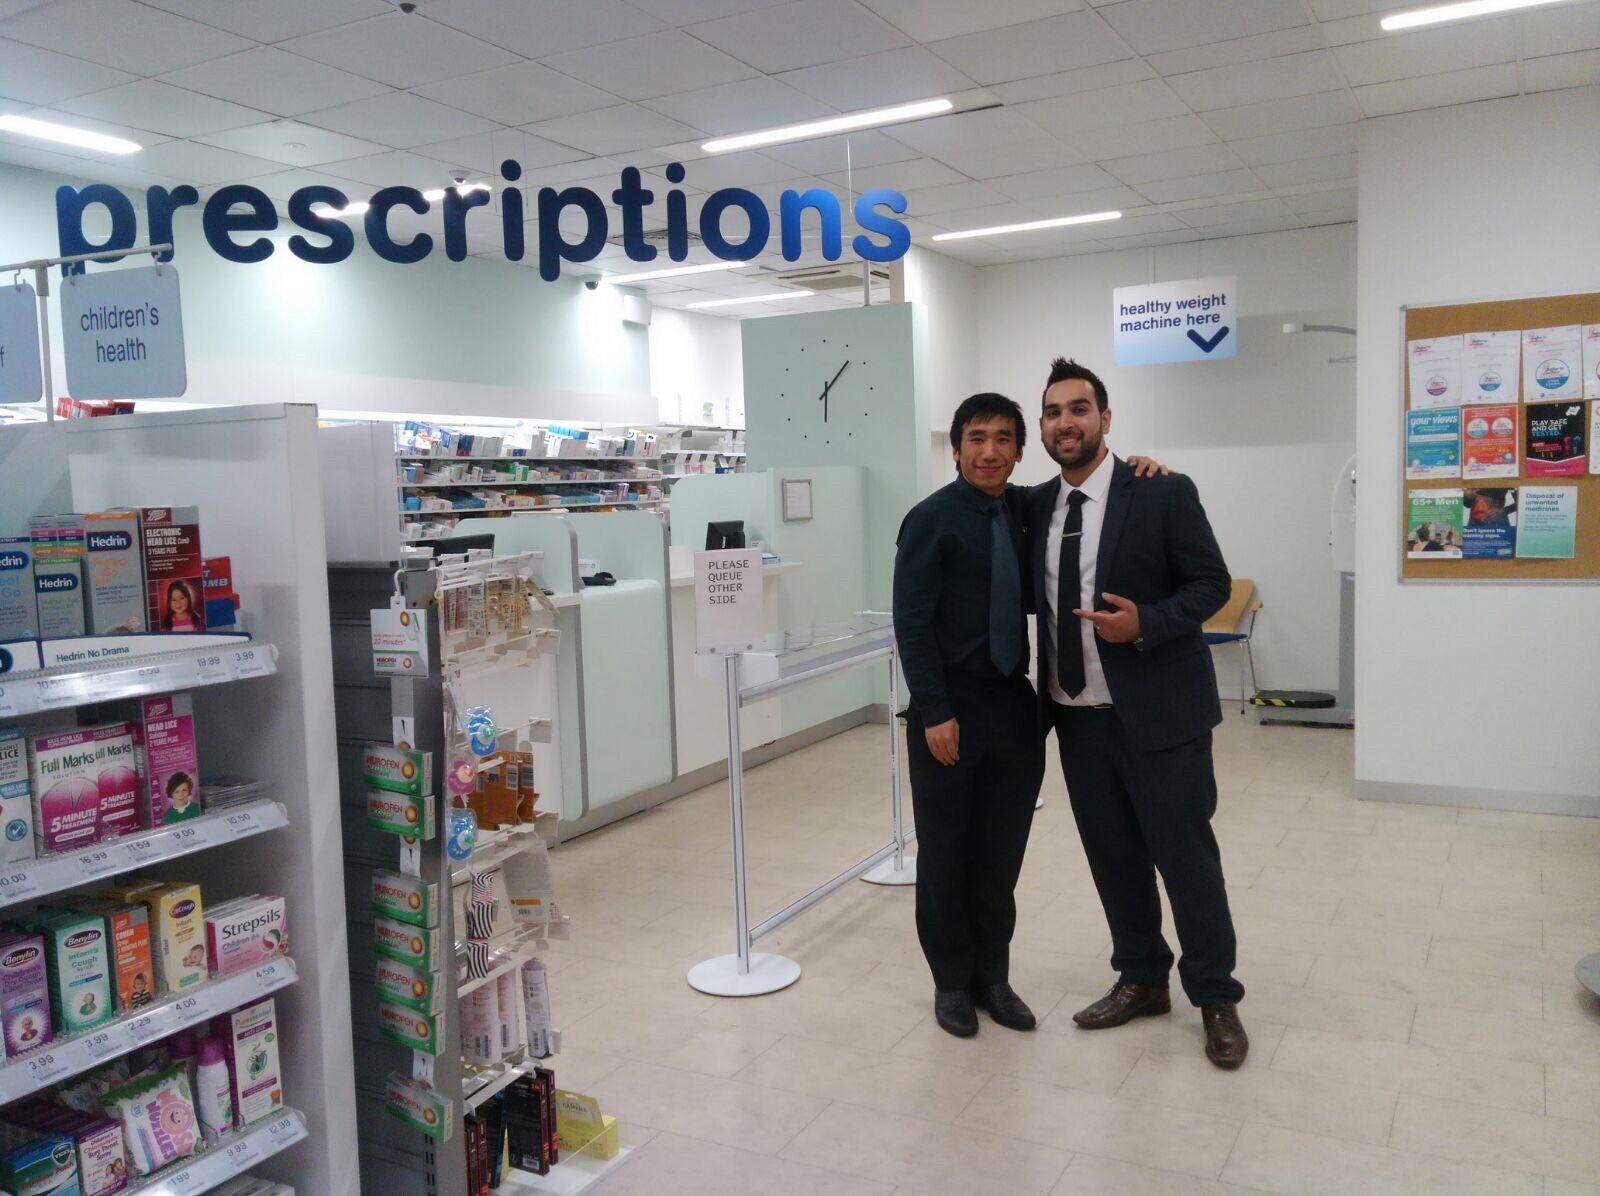 Hass Mohbat in the pharmacy